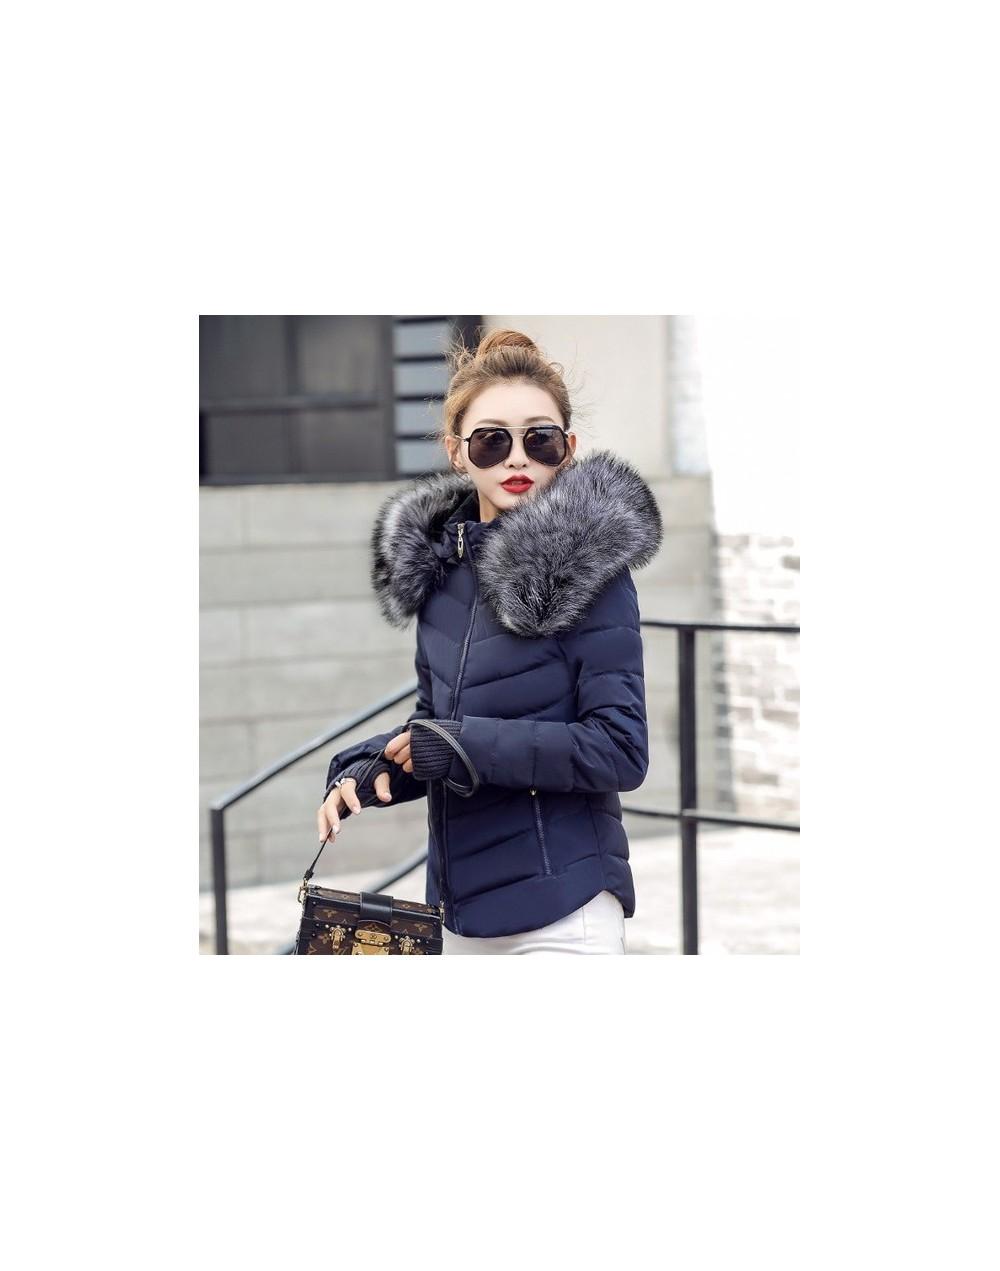 Fake raccoon fur collar parka down cotton jacket Winter Jacket Women thick Snow Wear Coat Lady Clothing Female Jackets Parka...